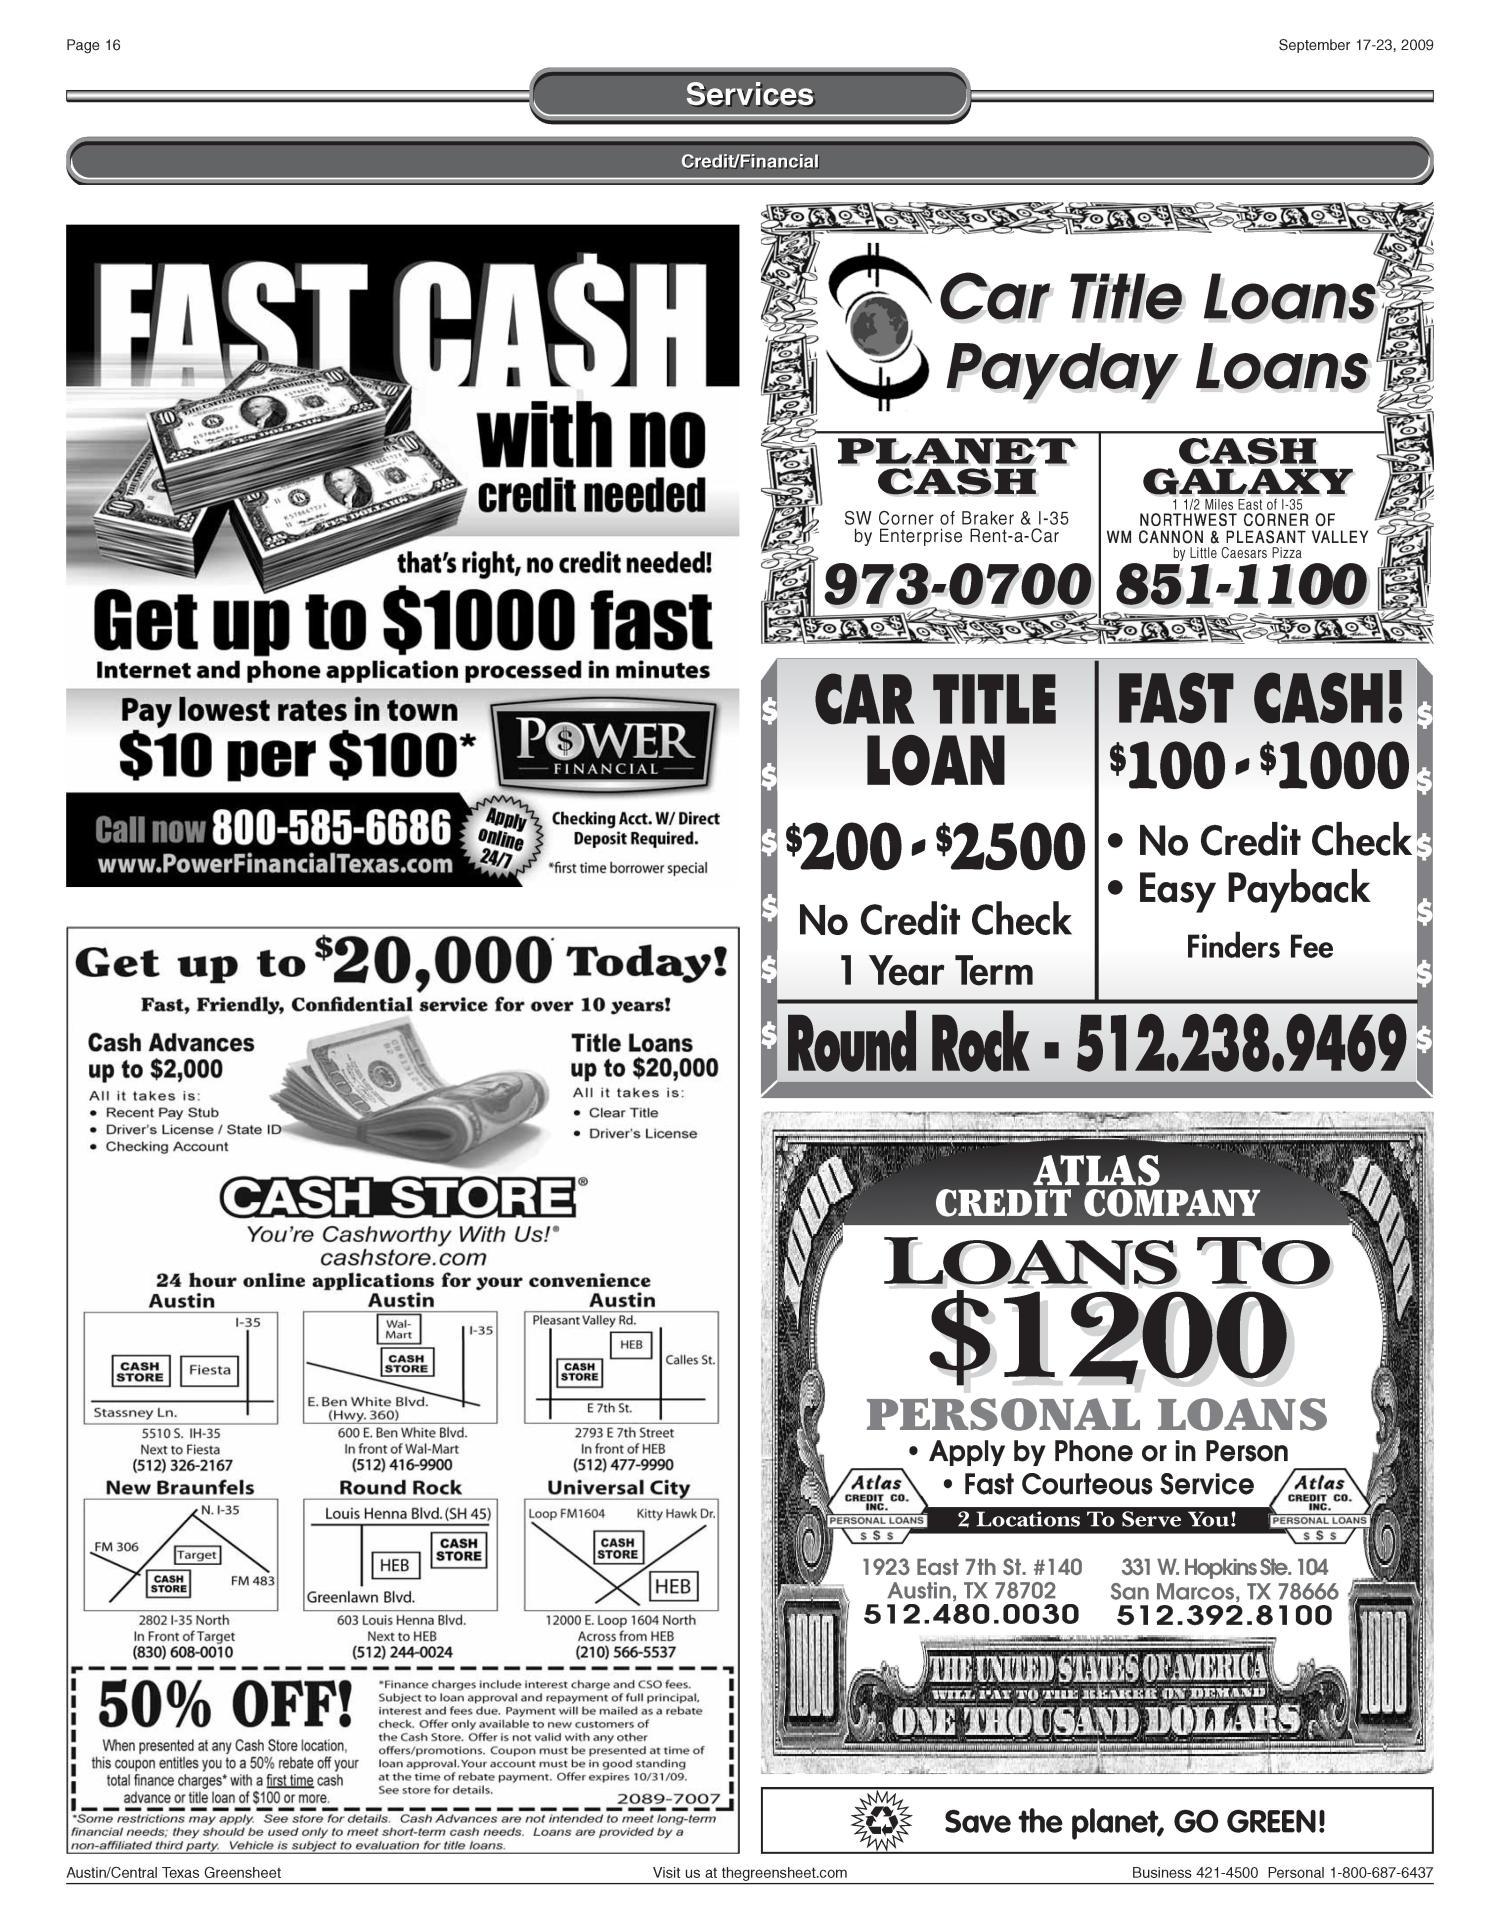 The Greensheet Austin Tex Vol 32 No Ed 1 Thursday September 17 2009